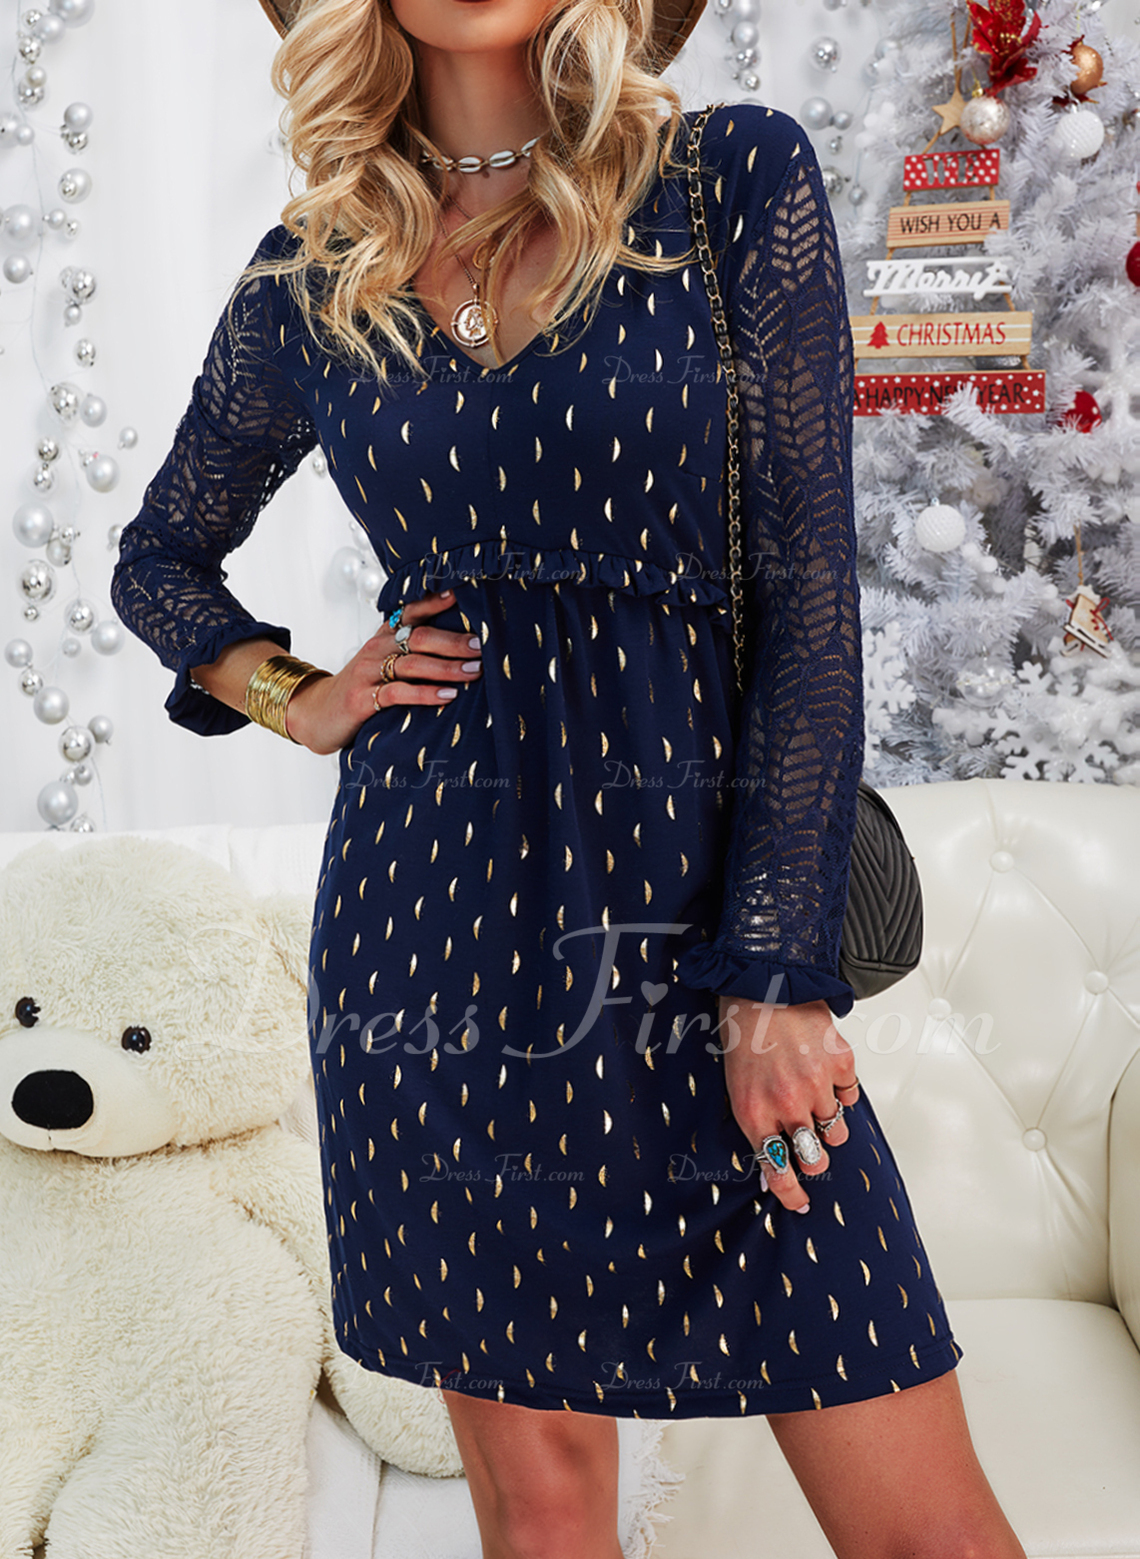 Lace Print Shift Long Sleeves Midi Casual Elegant Tunic Dresses